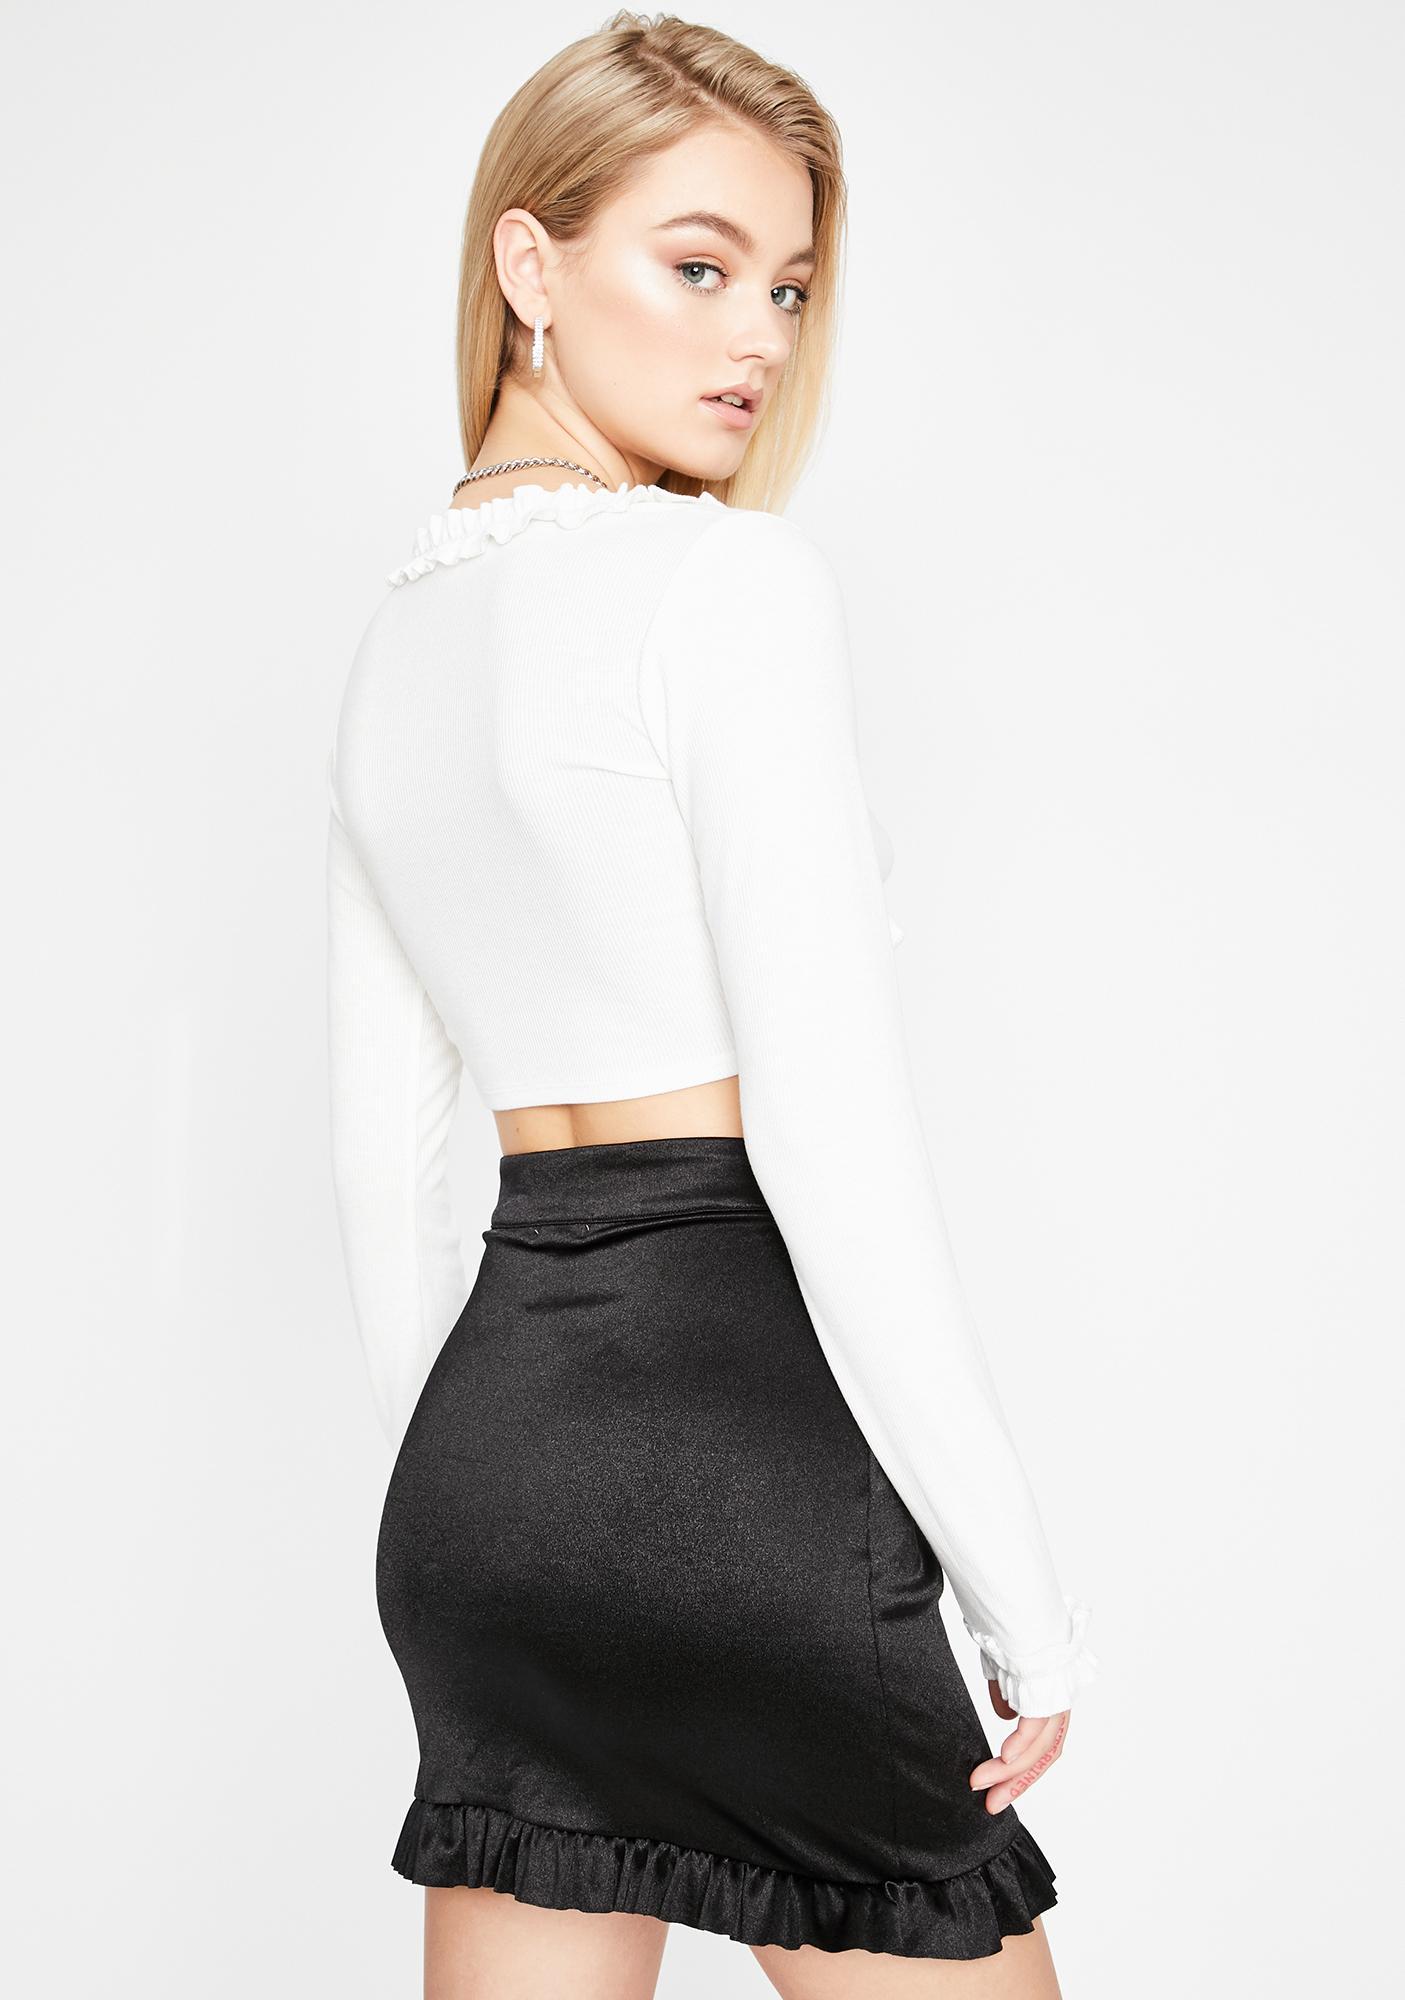 Sugar Thrillz Lessons In Love Mini Skirt